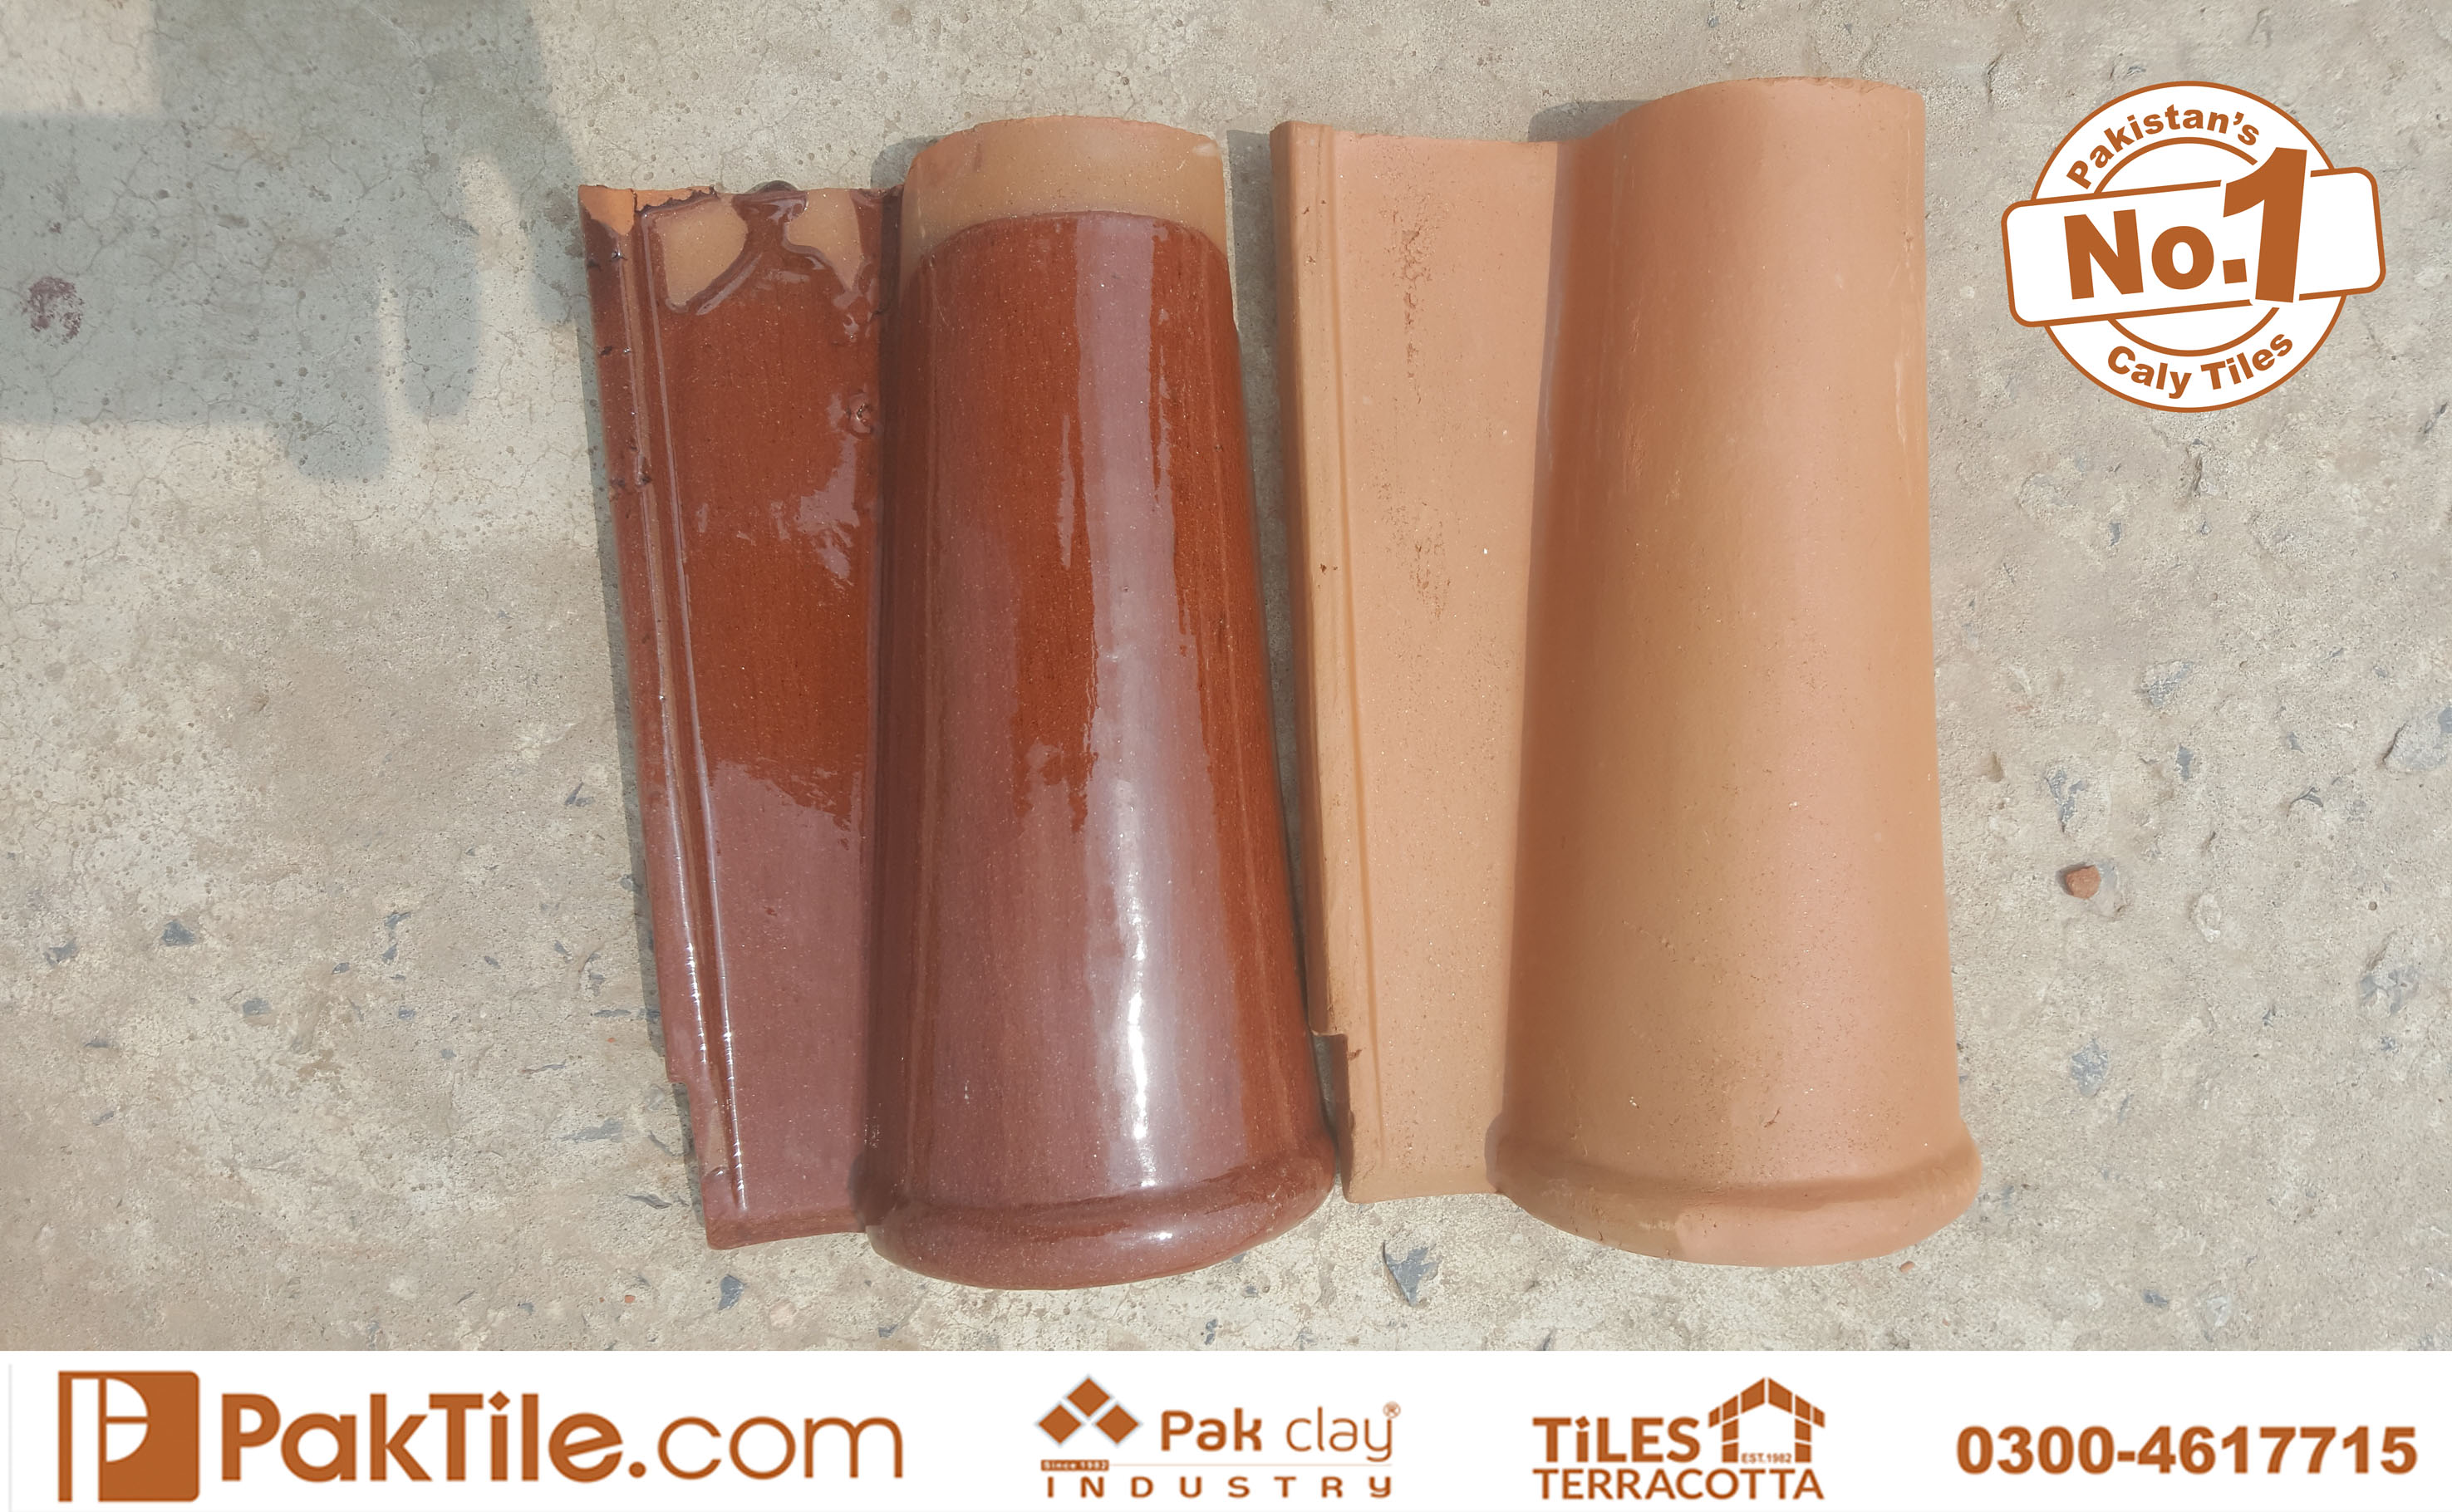 5 Pak clay Interlocking roof products spanish shingles irani china tiles in lahore karachi islamabad